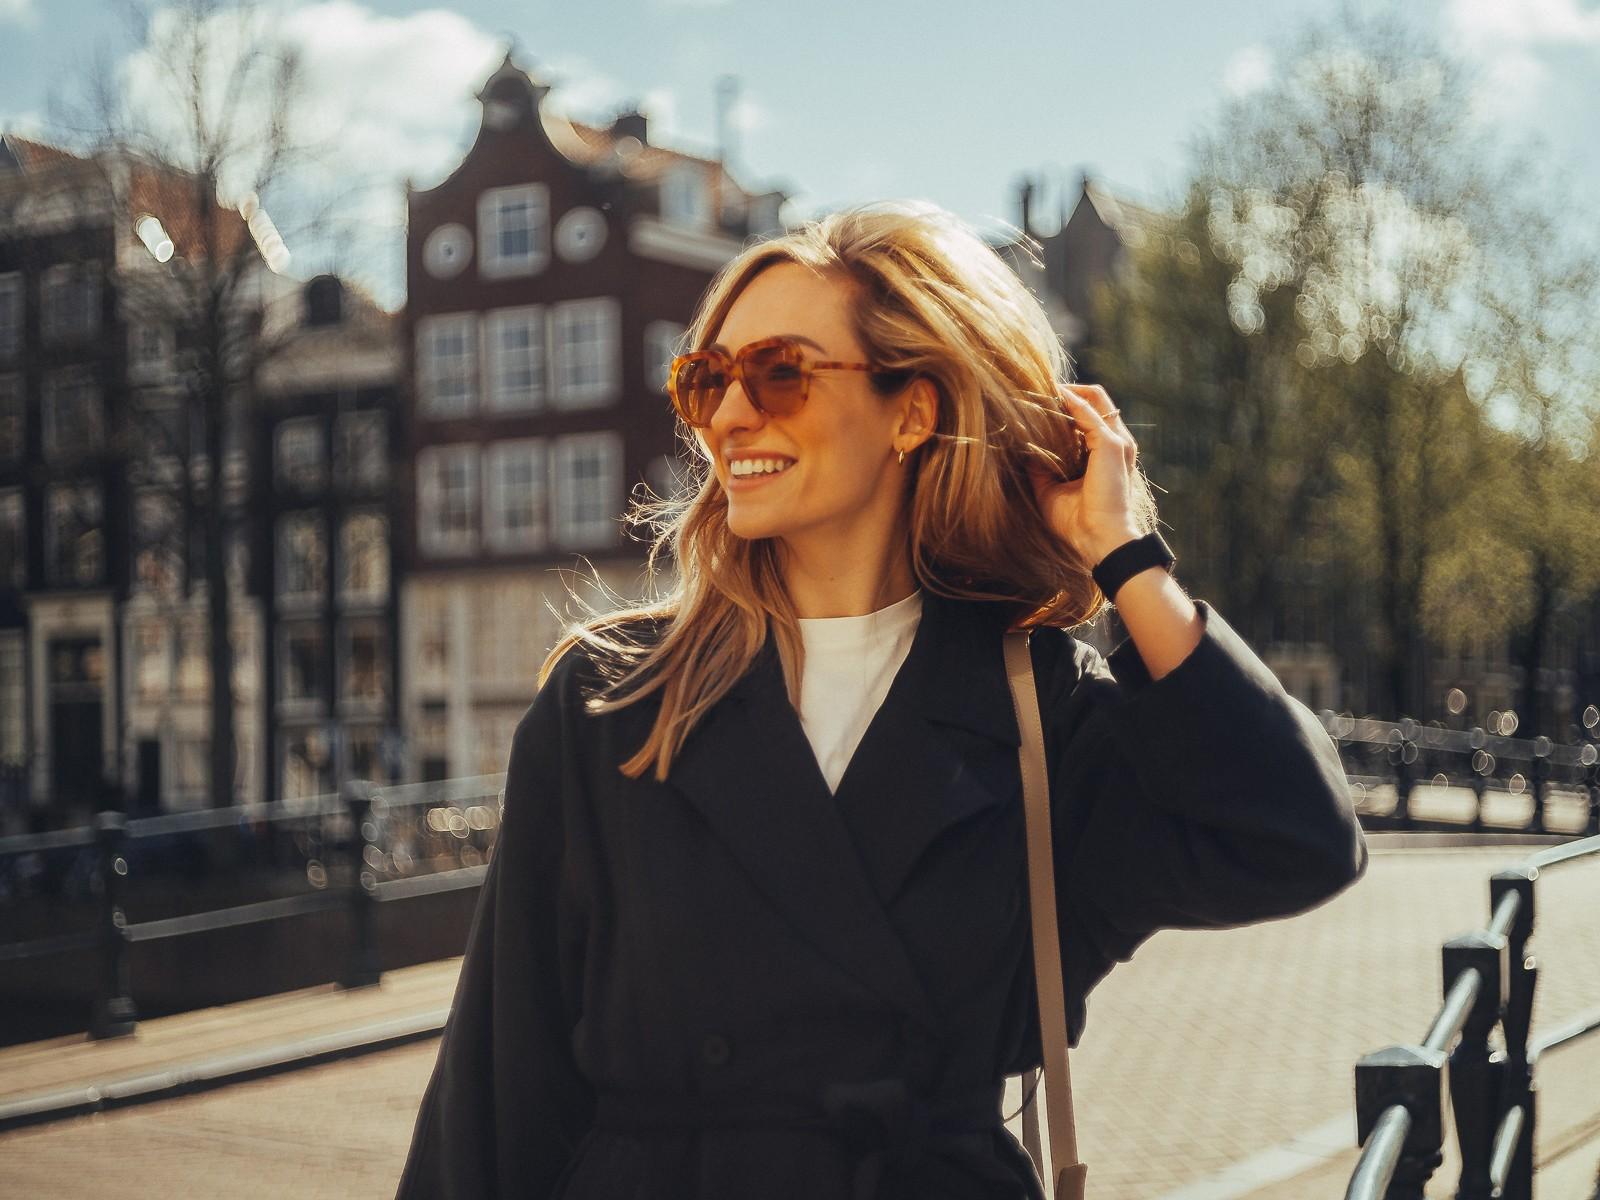 Professionele portretfotograaf in Amsterdam